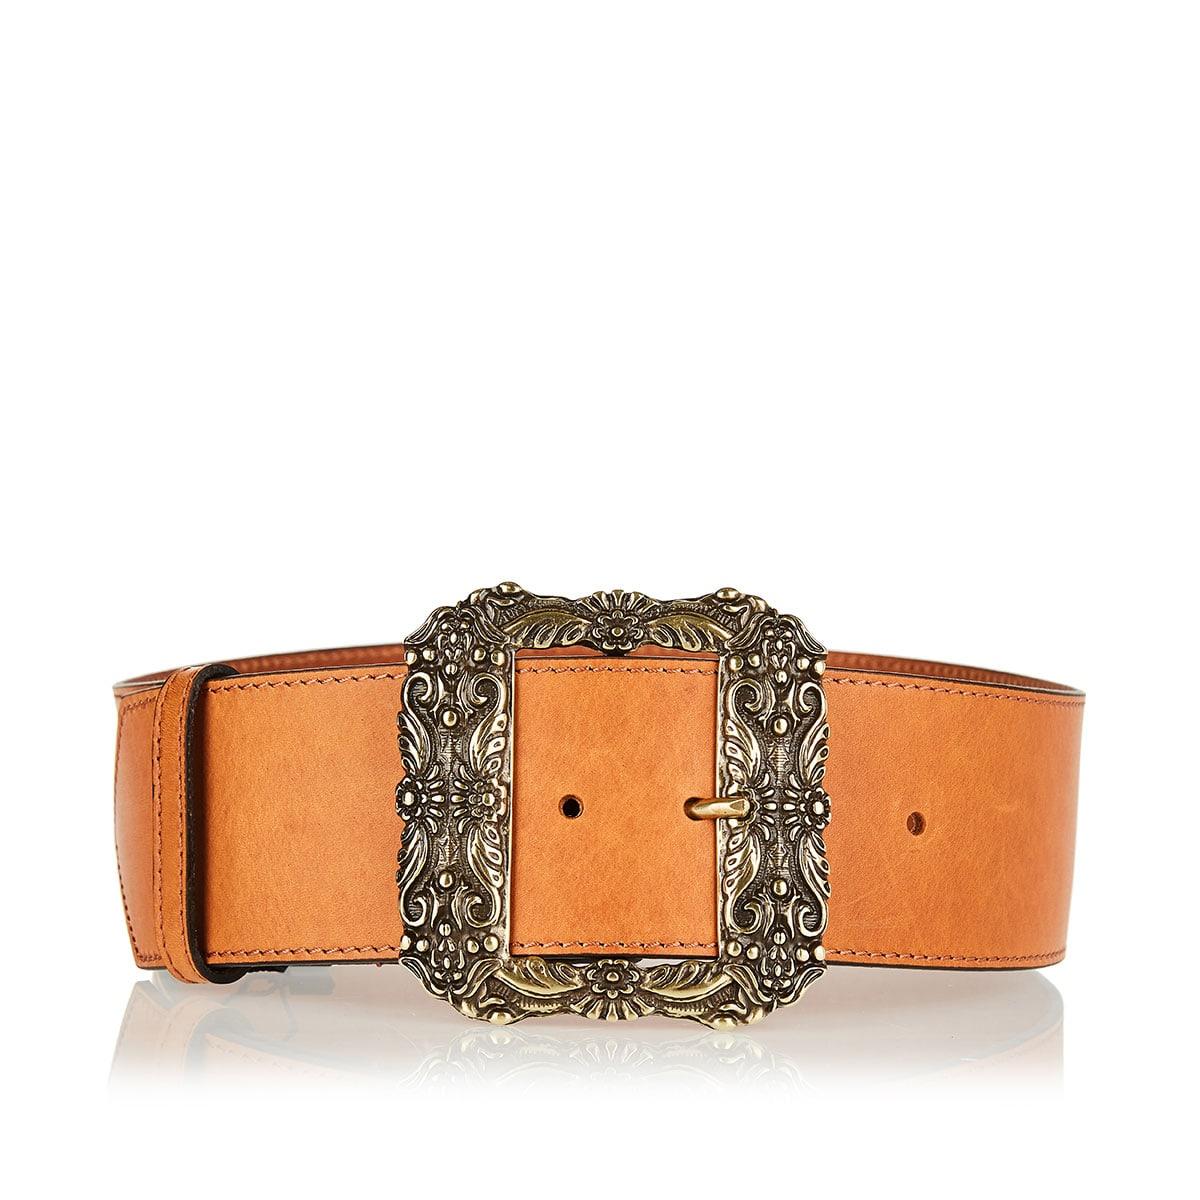 Wide belt with oversized metal buckle